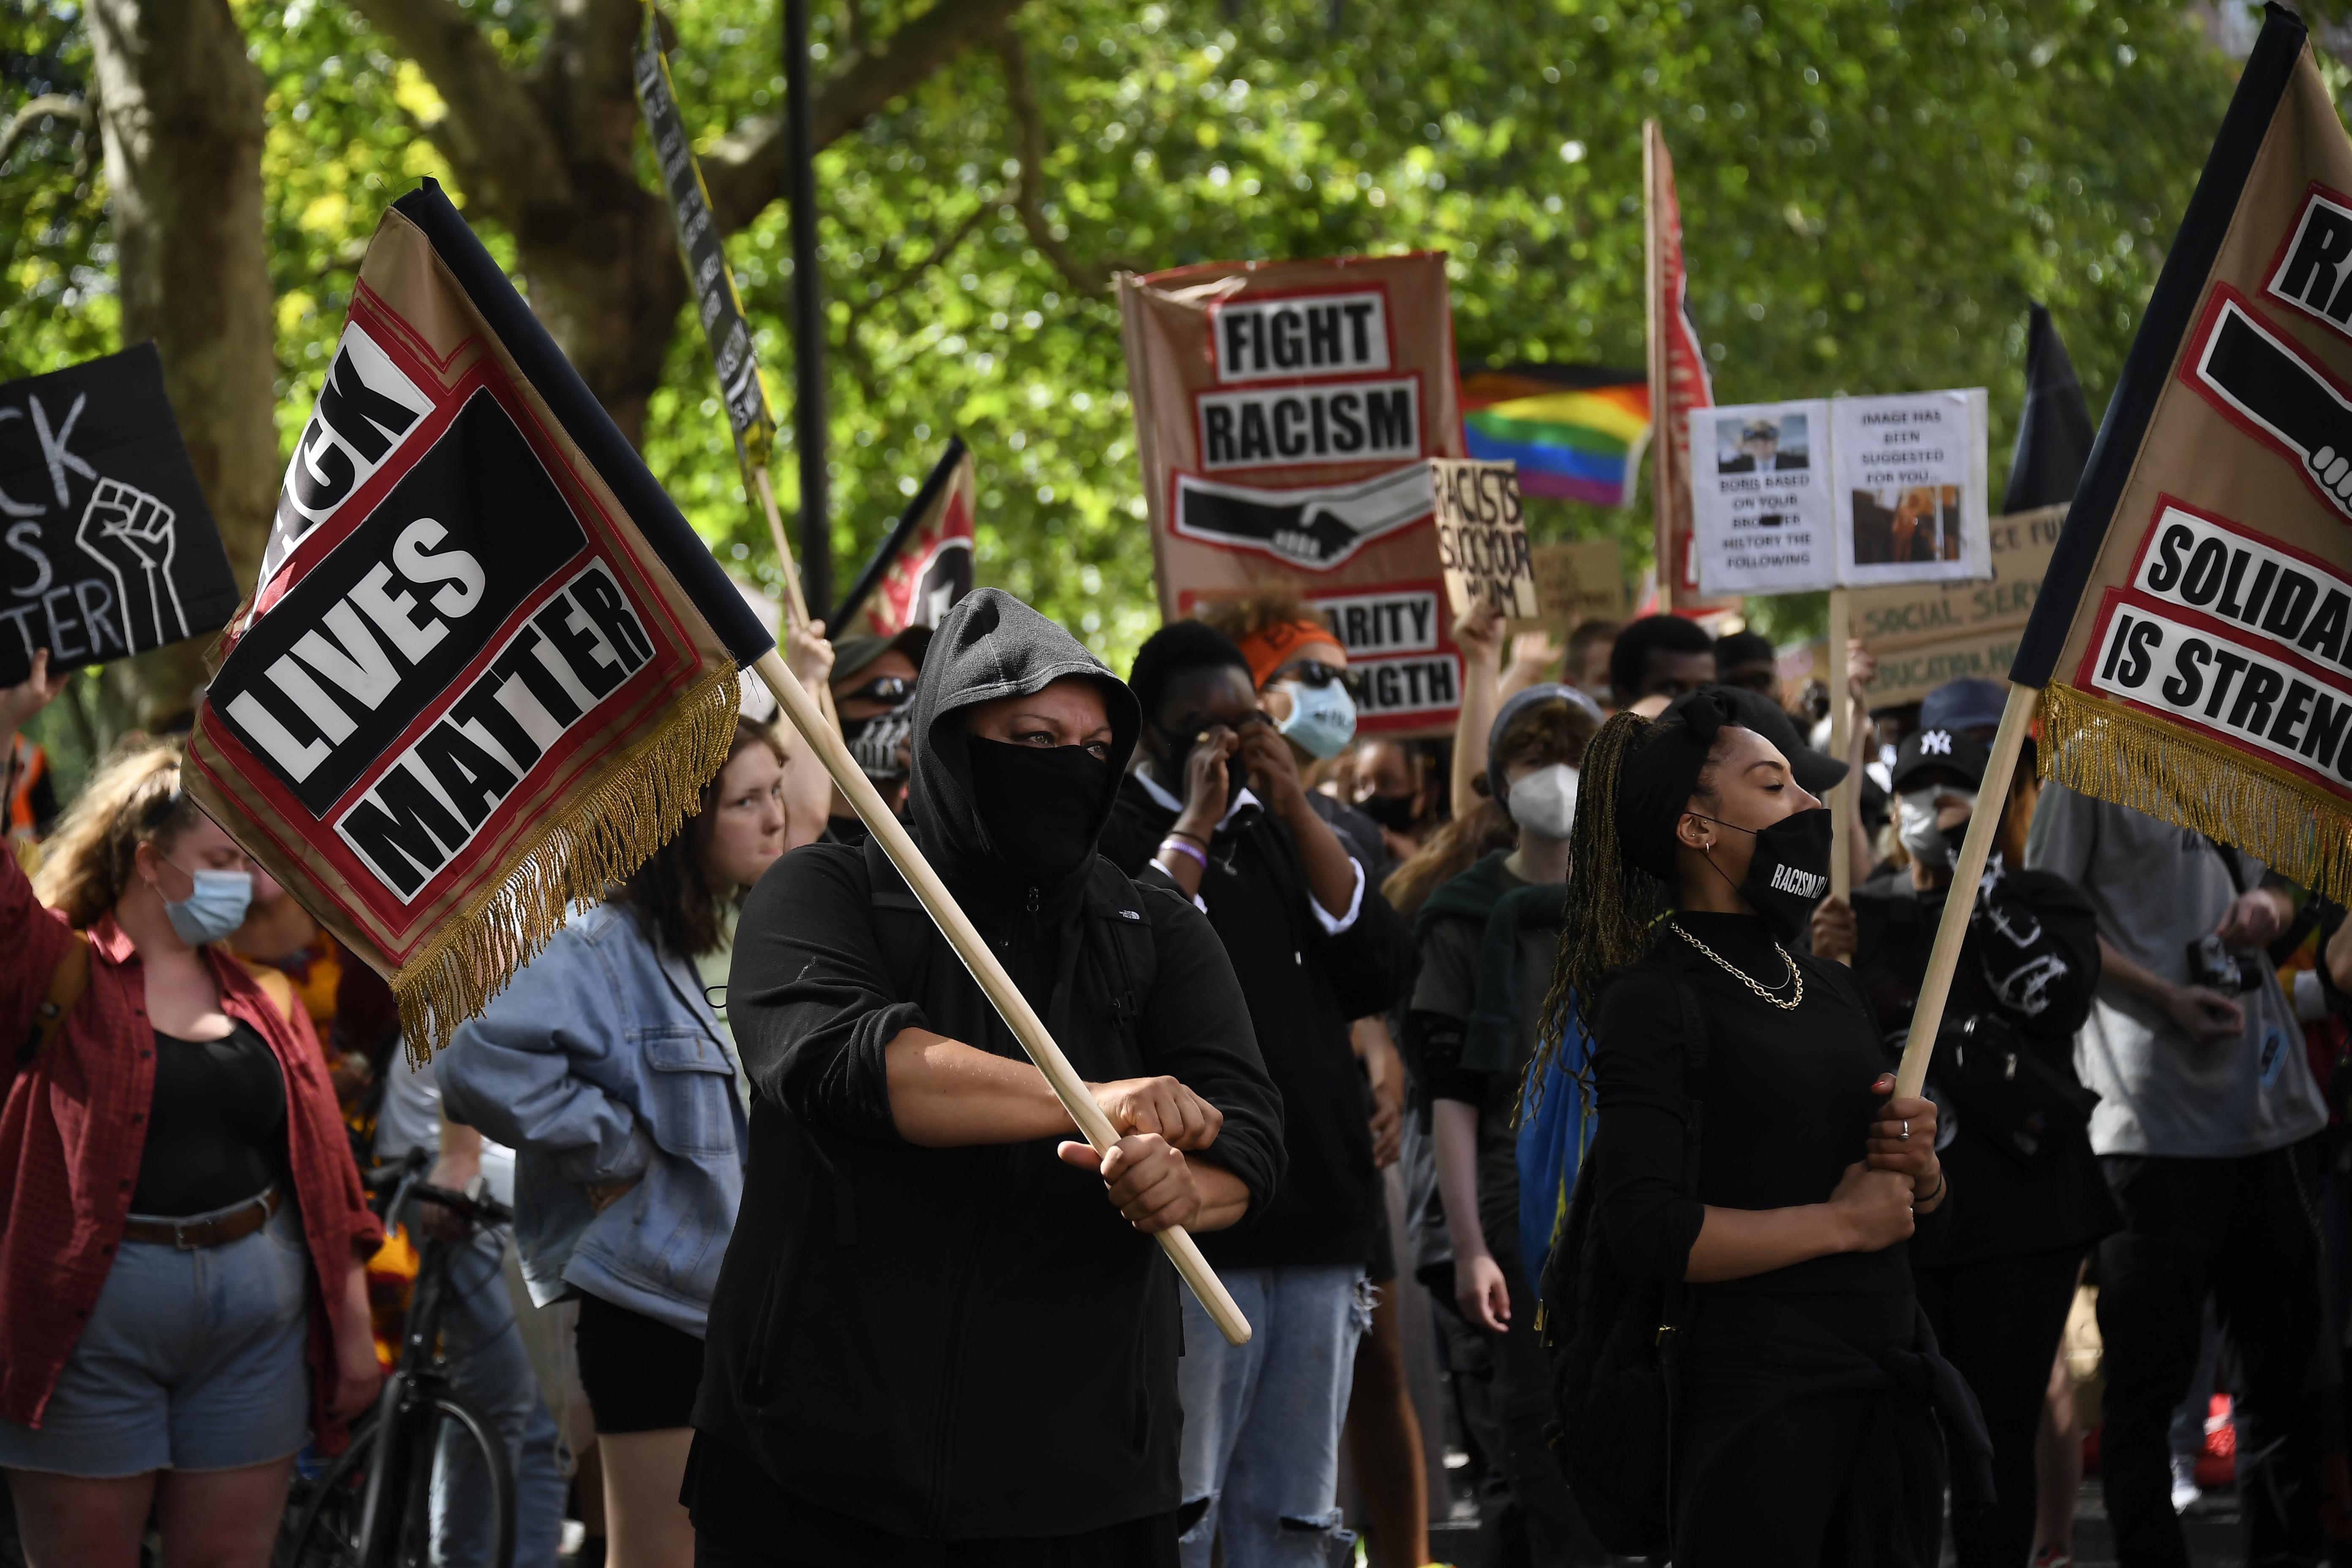 Image: AP Photo/Alberto Pezzali/ Protest